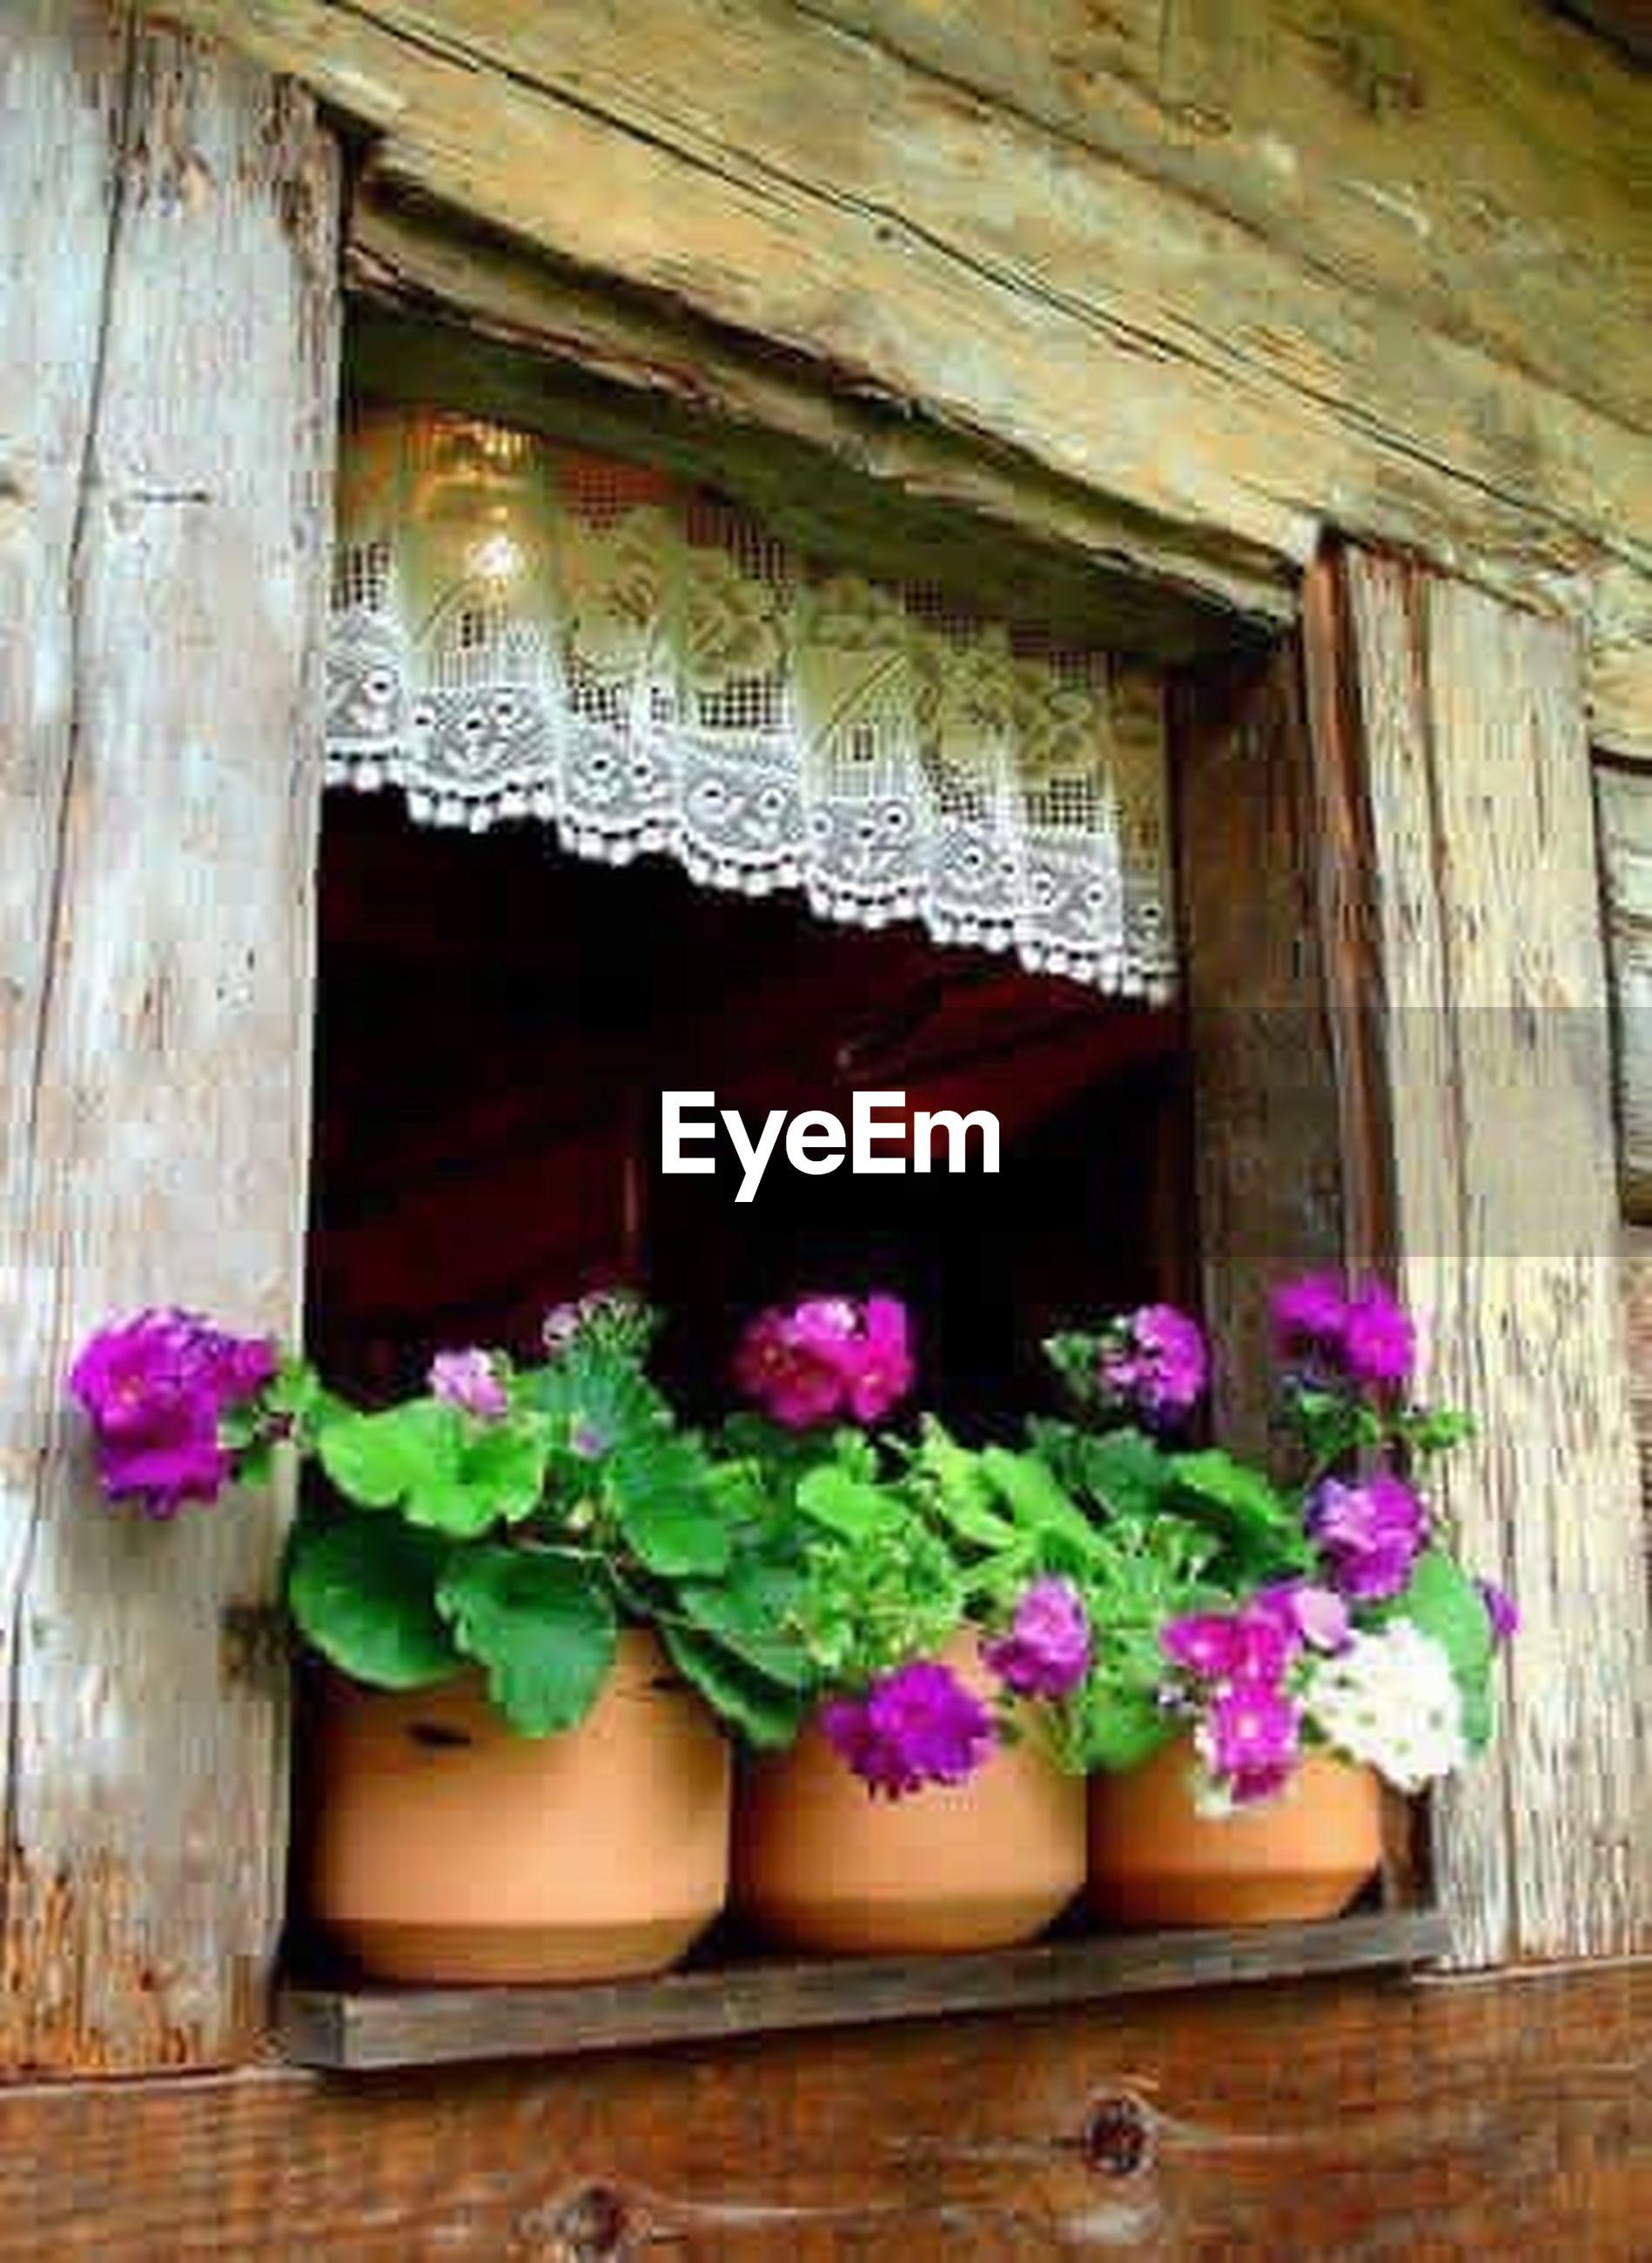 flower, indoors, freshness, wood - material, fragility, potted plant, plant, decoration, house, architecture, built structure, window, growth, variation, vase, no people, bouquet, petal, nature, arrangement